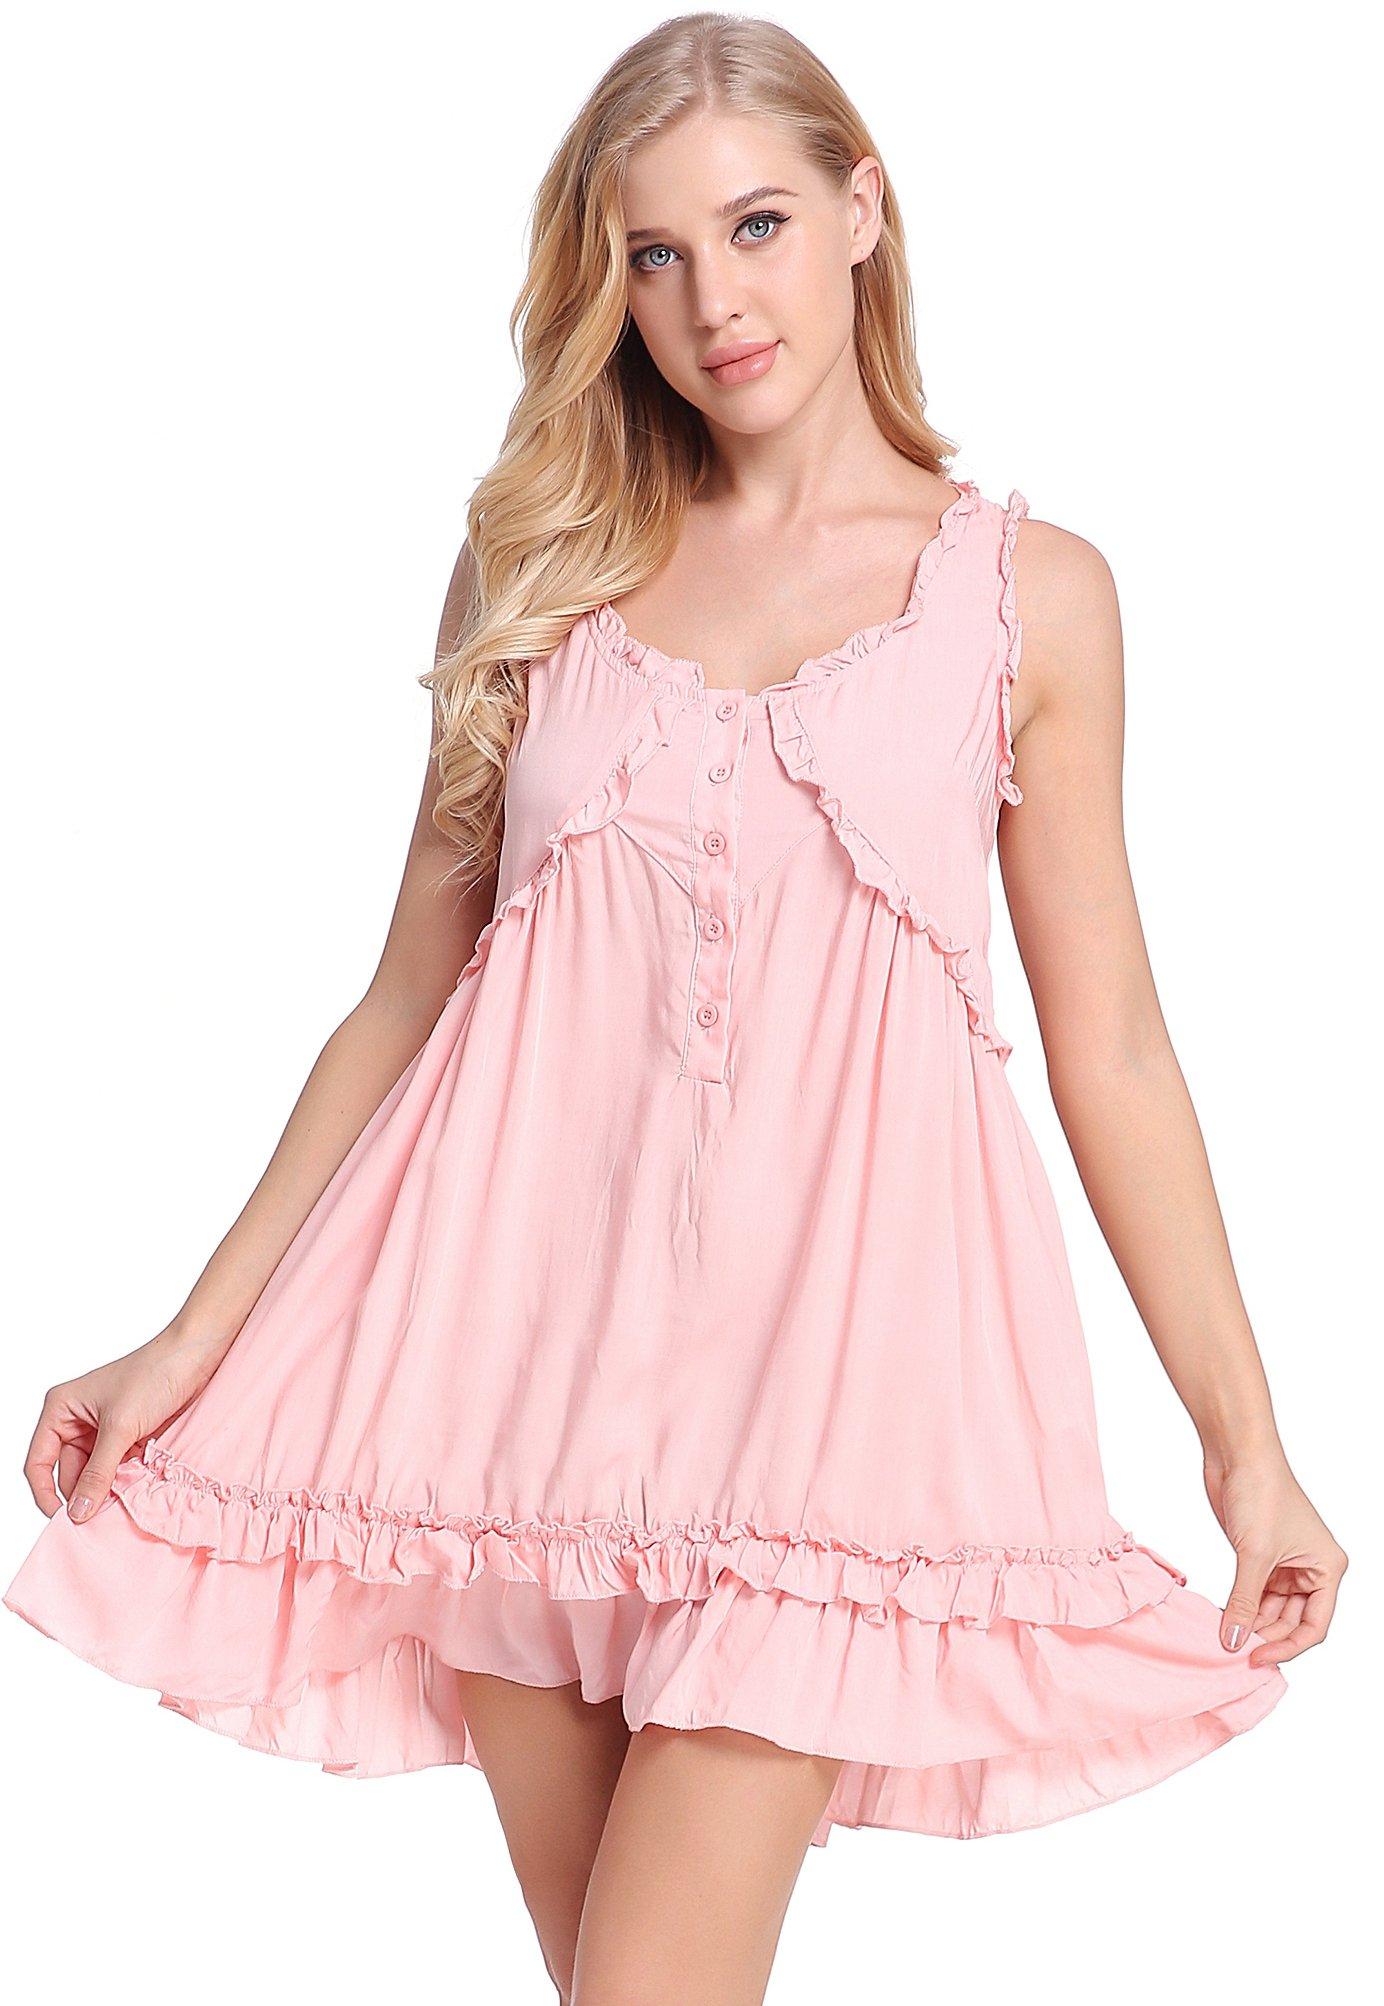 NORA TWIPS Victorian Style Nightgown for Women Sleeveless Sleepwear Ruffle Short Dress (Pink,M)